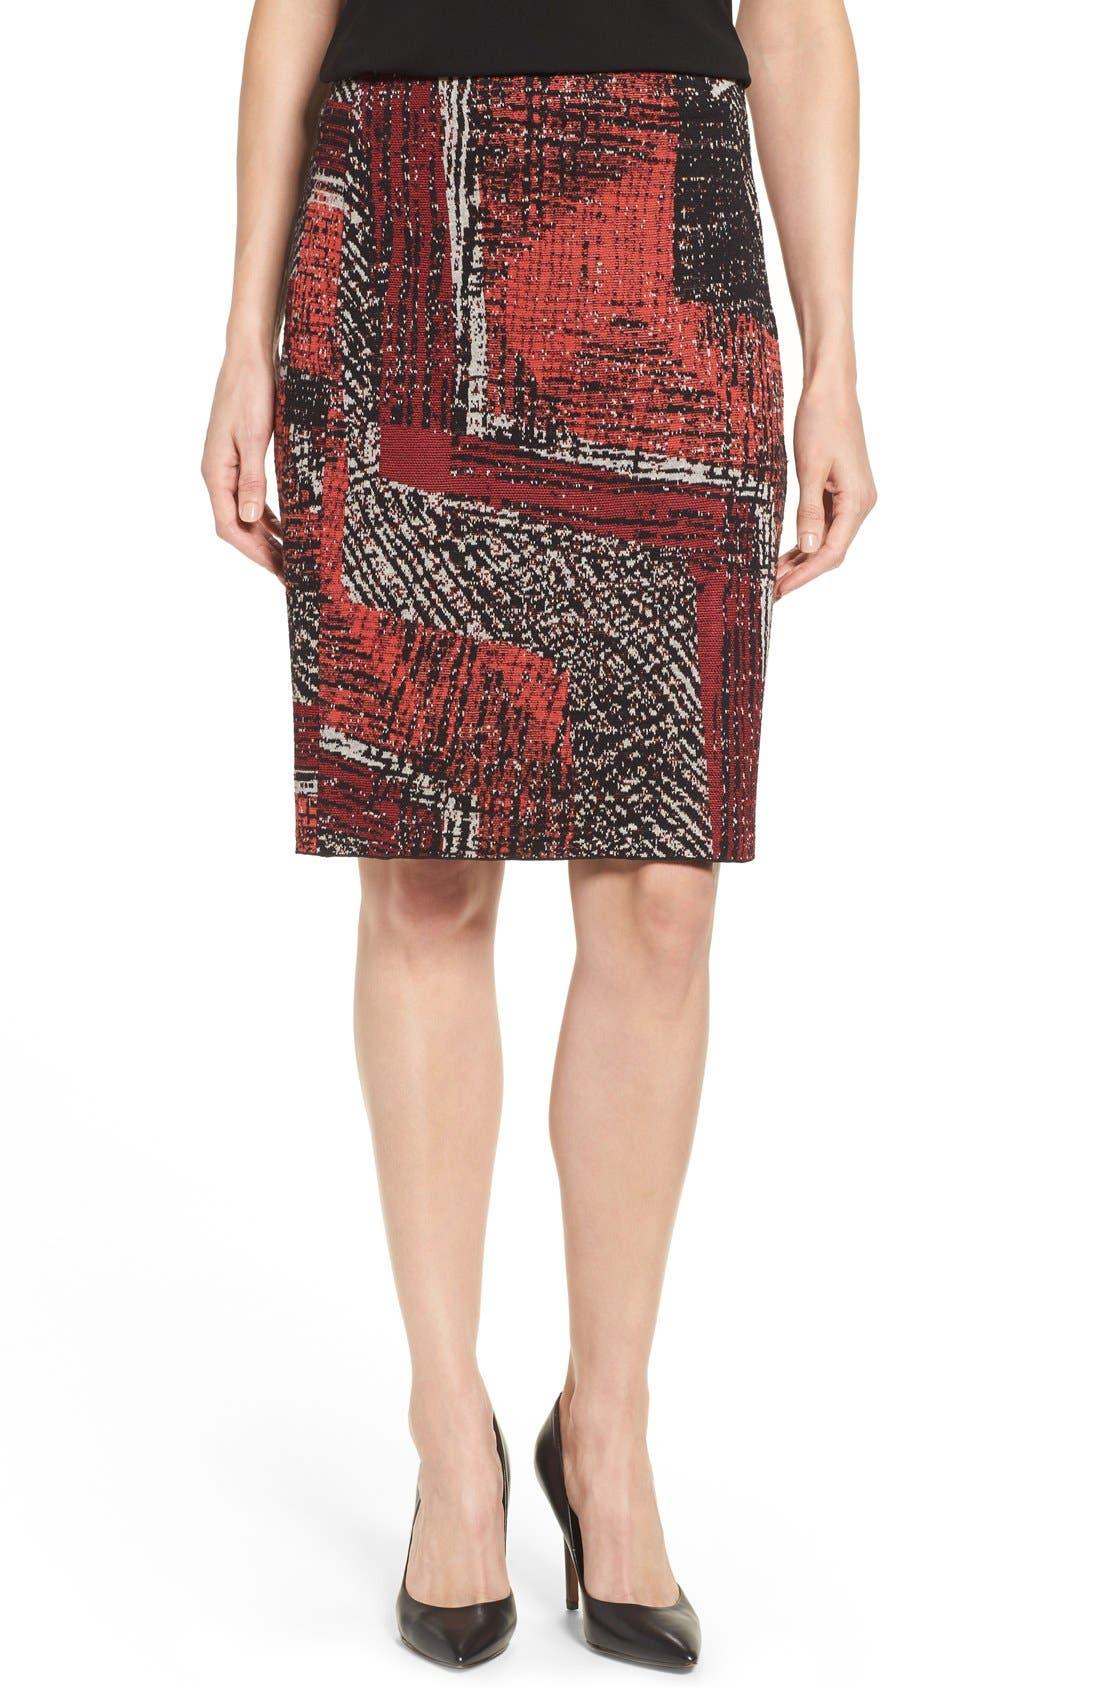 Main Image - NIC+ZOE 'Making Marks' Print Knit Pencil Skirt (Regular & Petite)